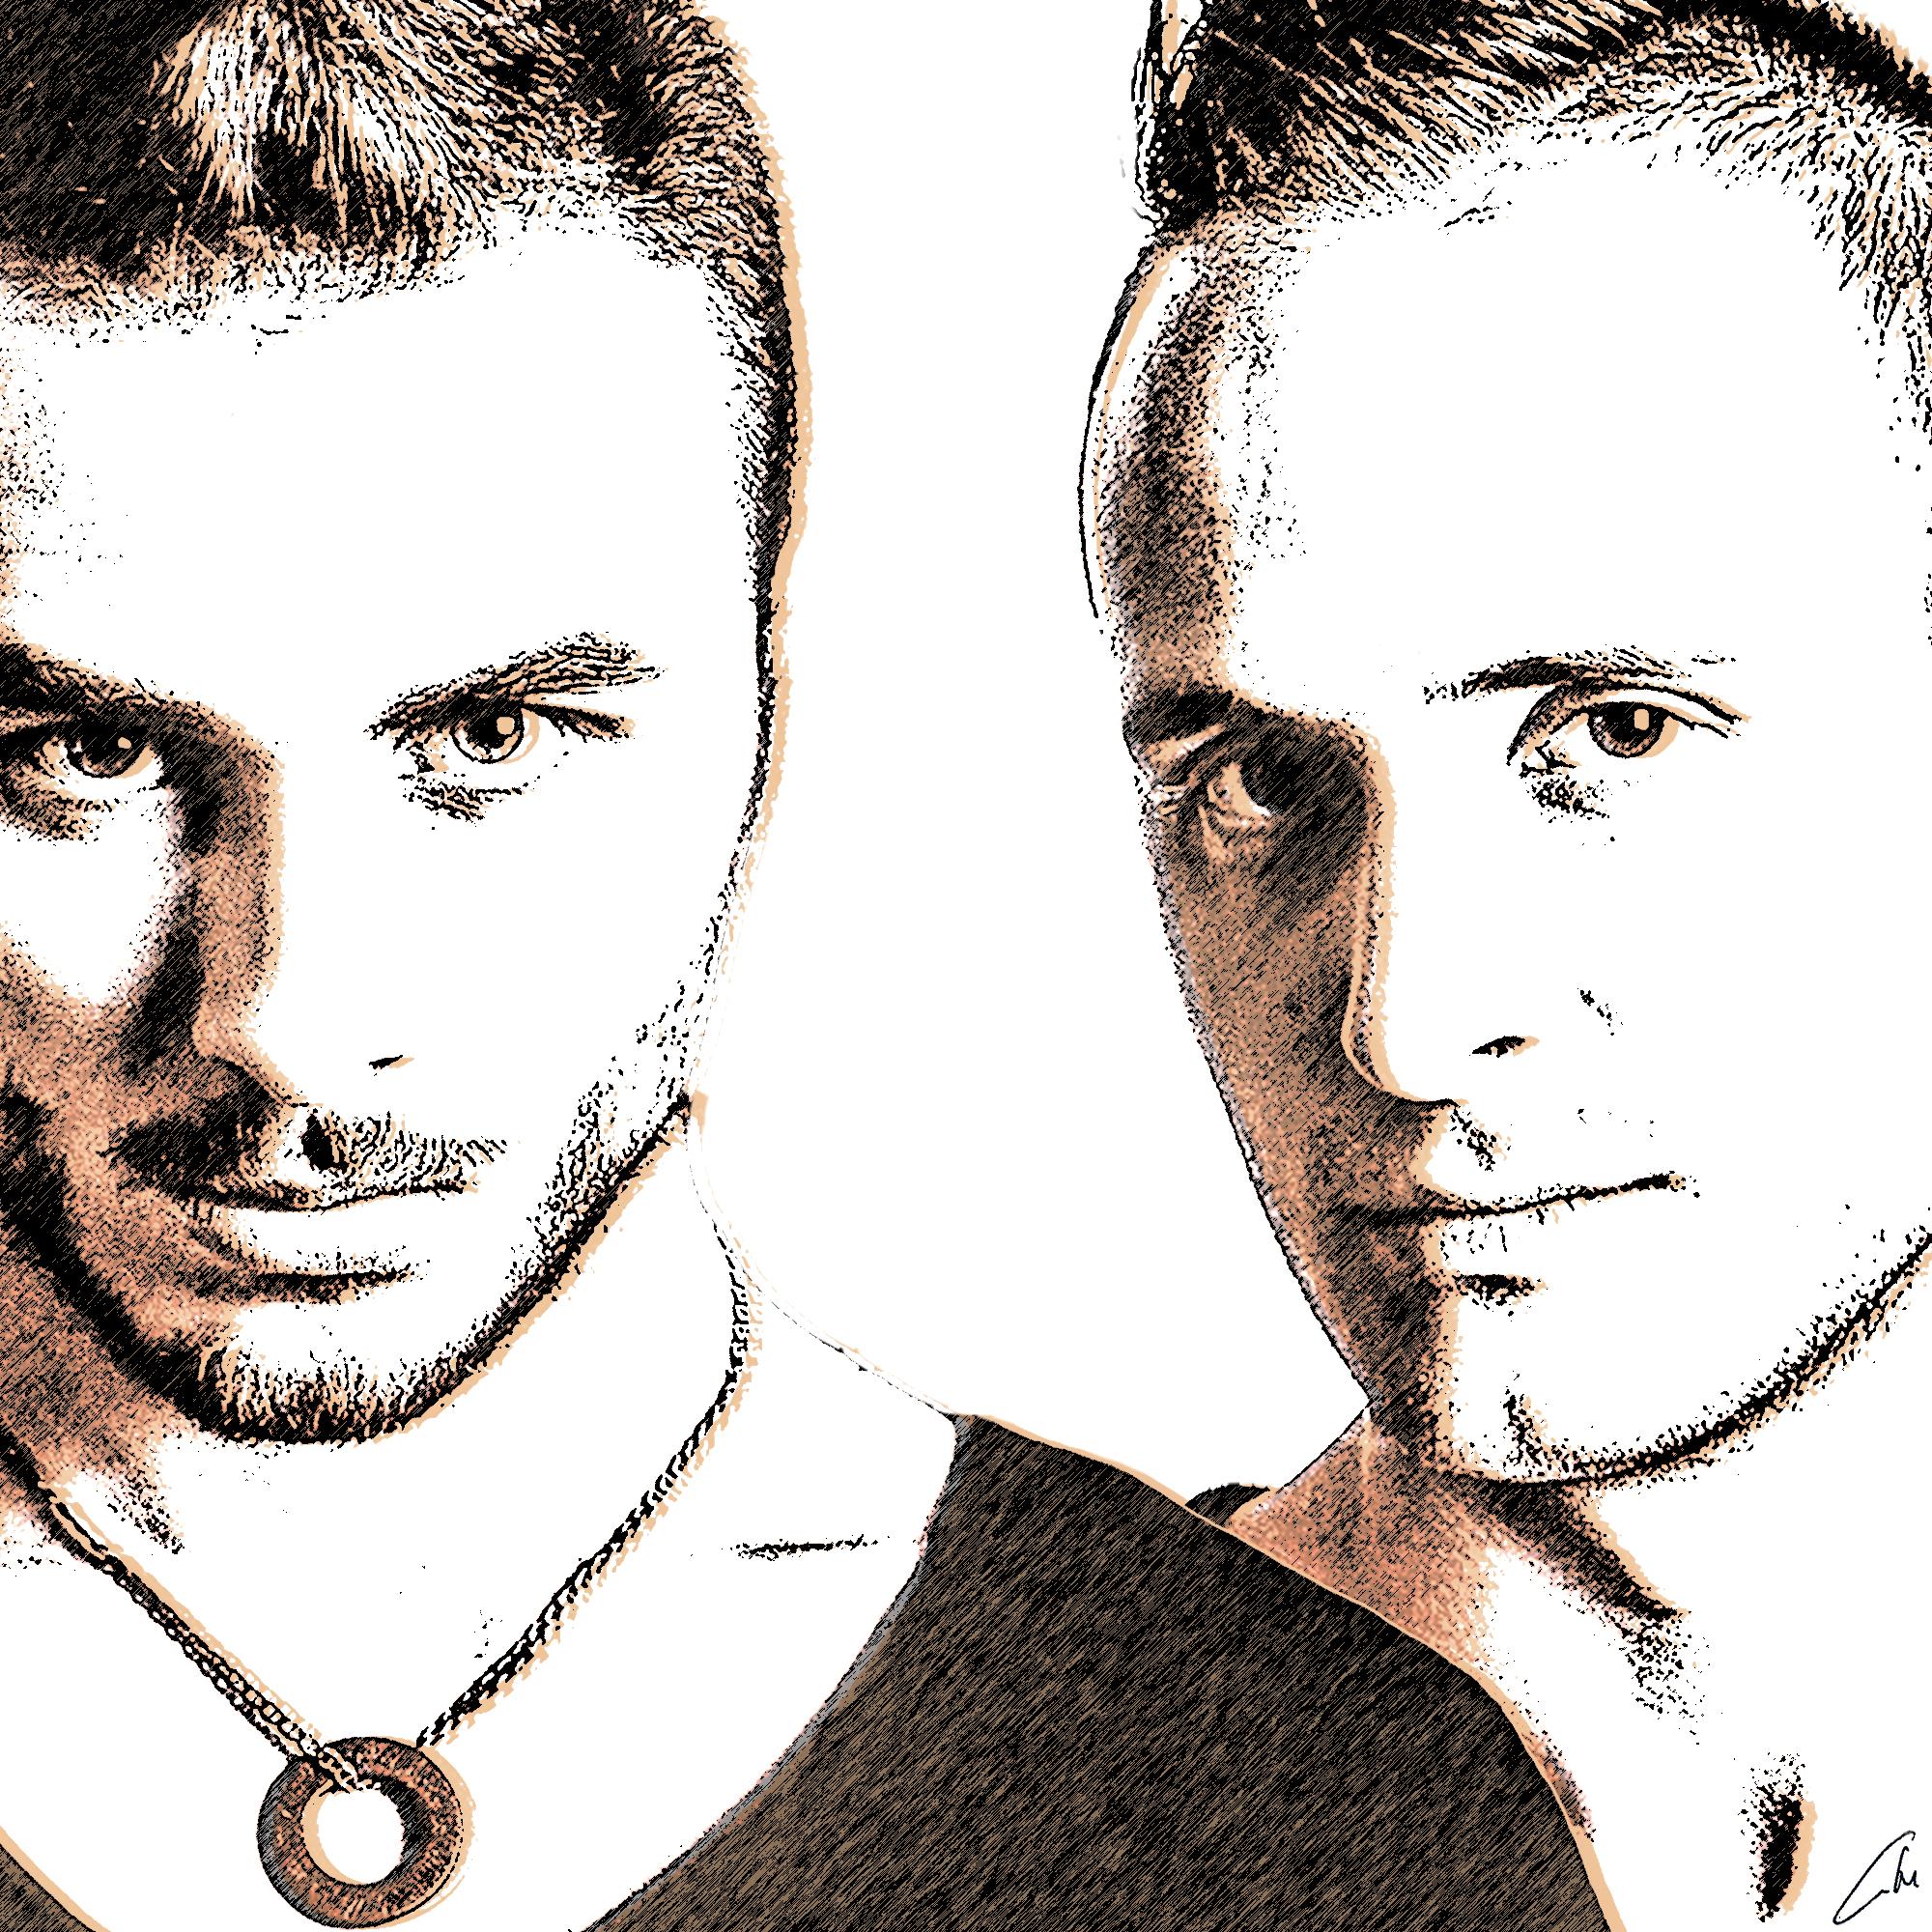 NGD Project Michael Gadani Alberto Tavanti Top Producers Art Music Arezzo